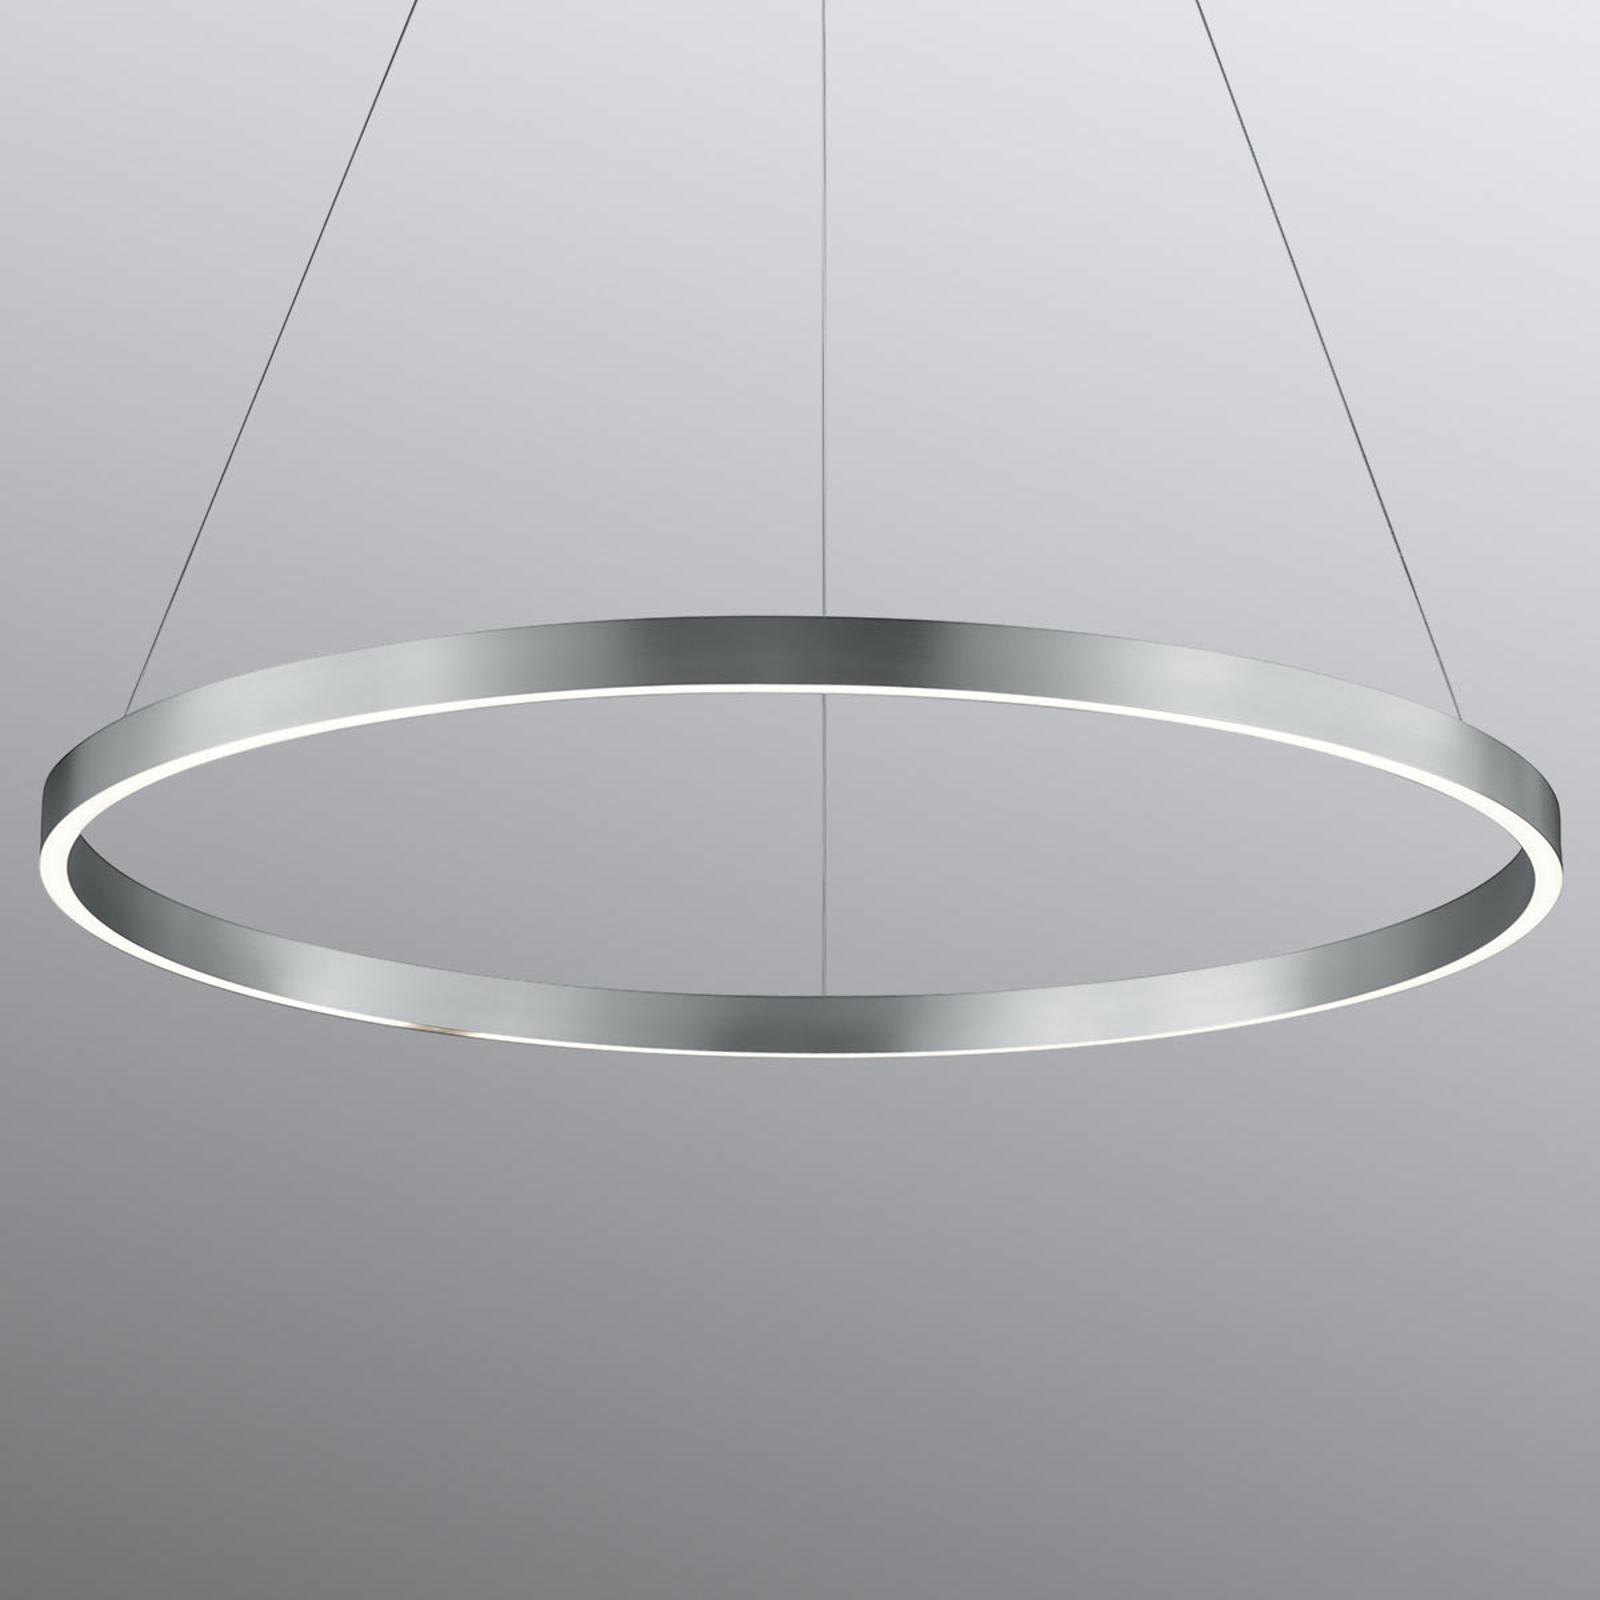 Circle - LED-pendellampe med gestestyring